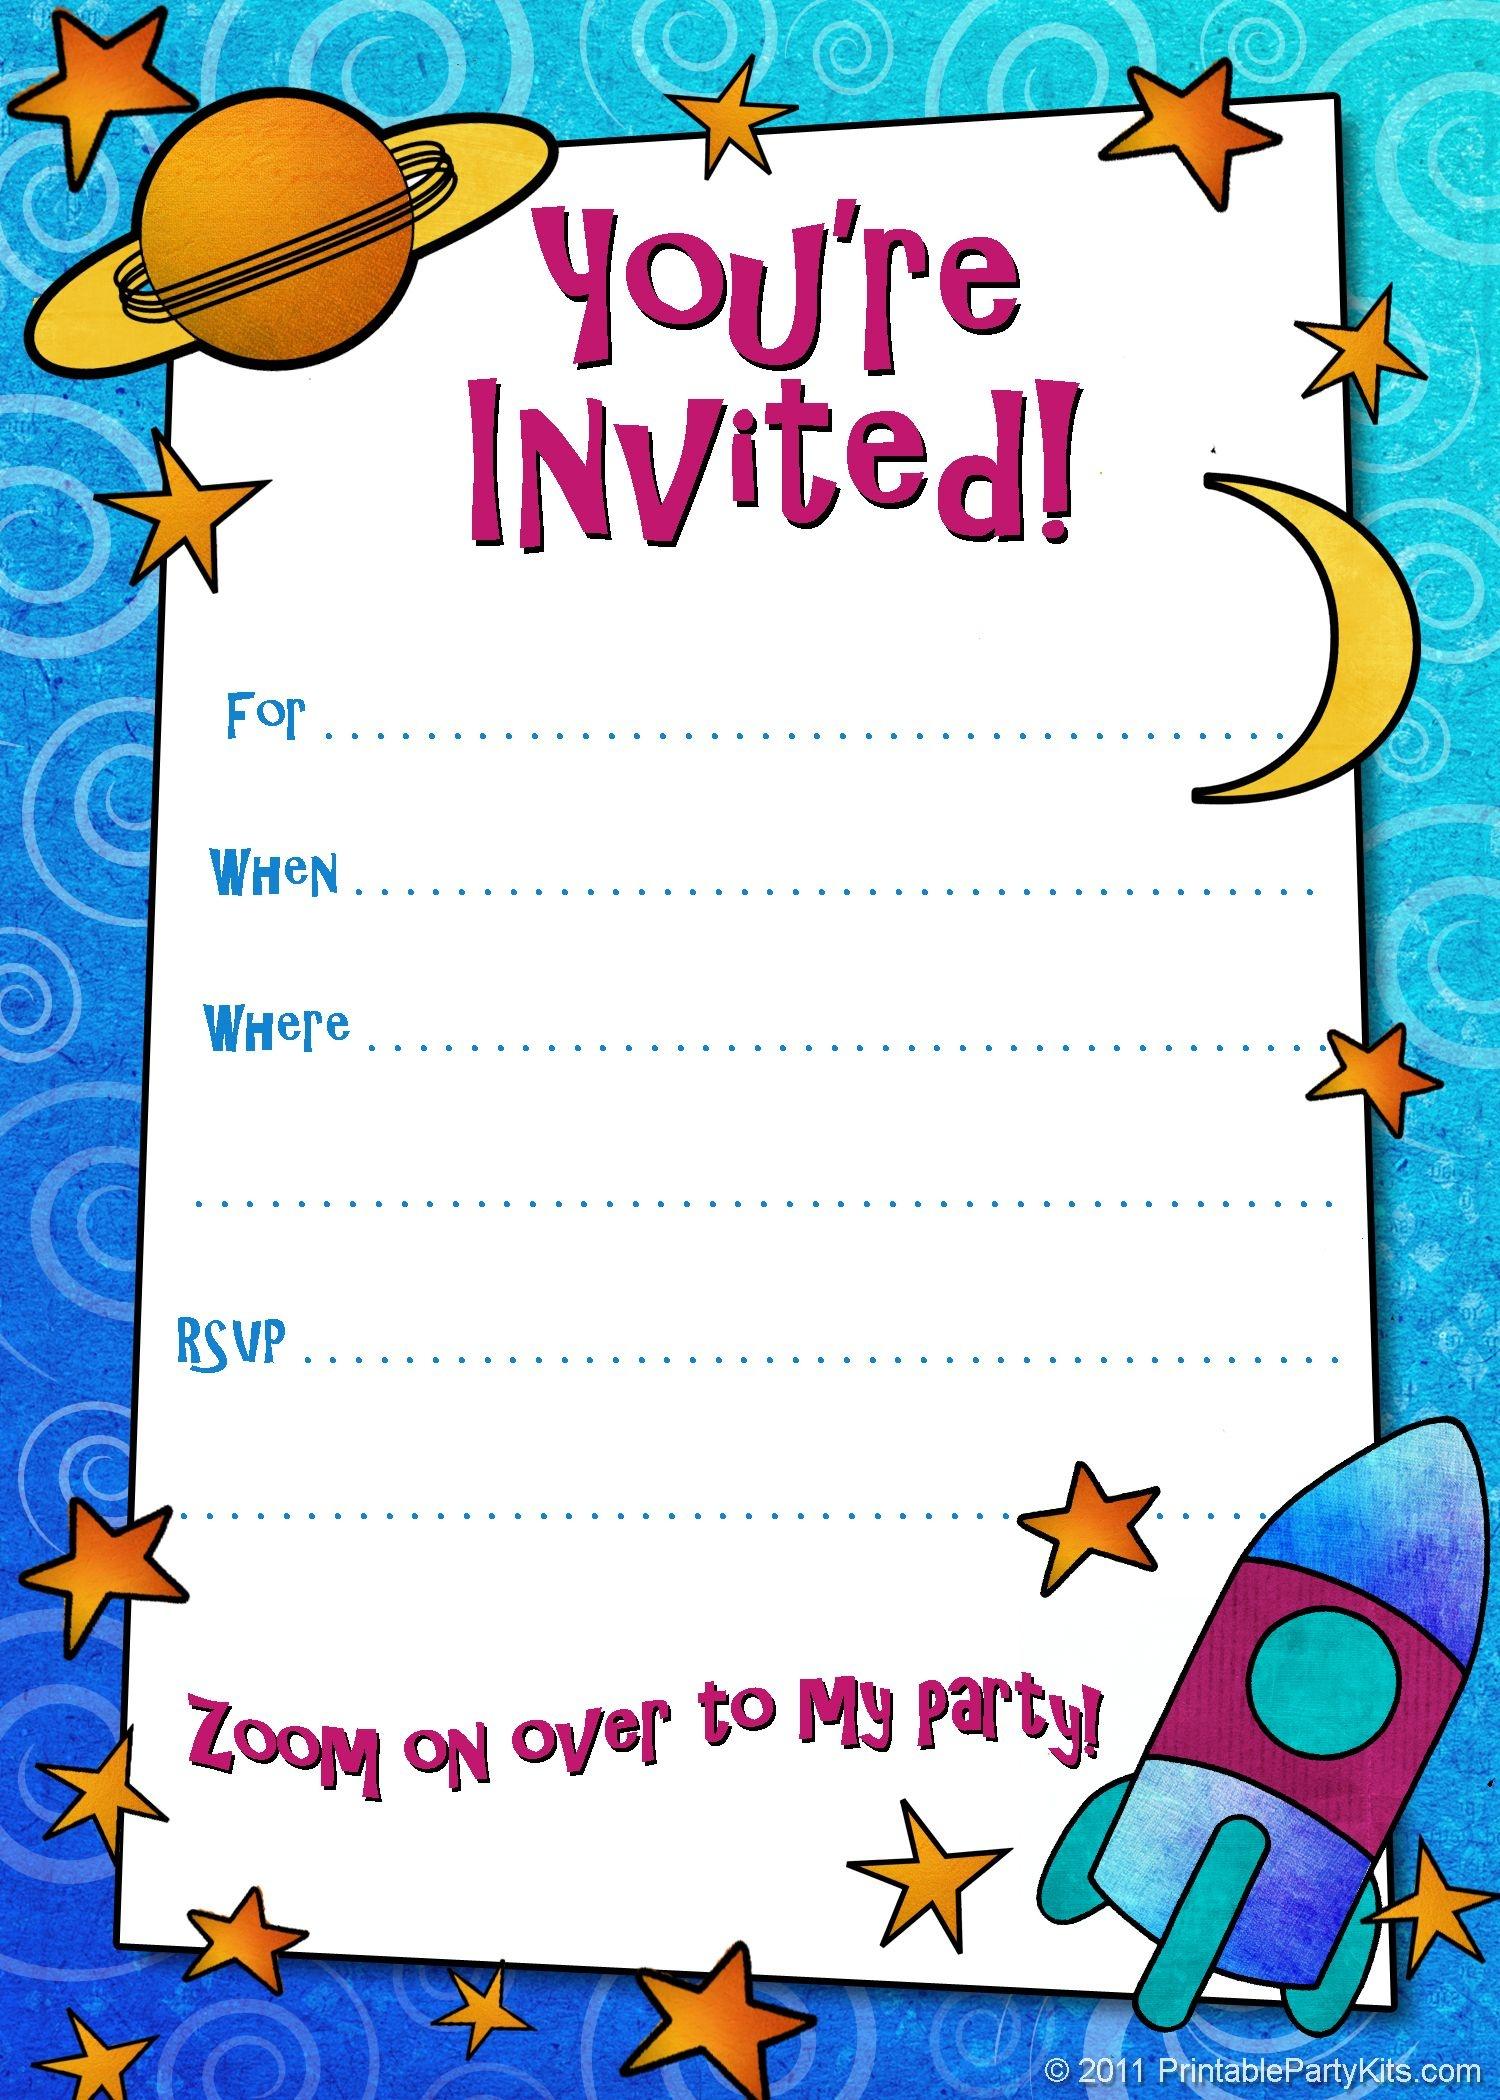 Free Printable Boys Birthday Party Invitations | Birthday Party - Free Printable Toddler Birthday Invitations